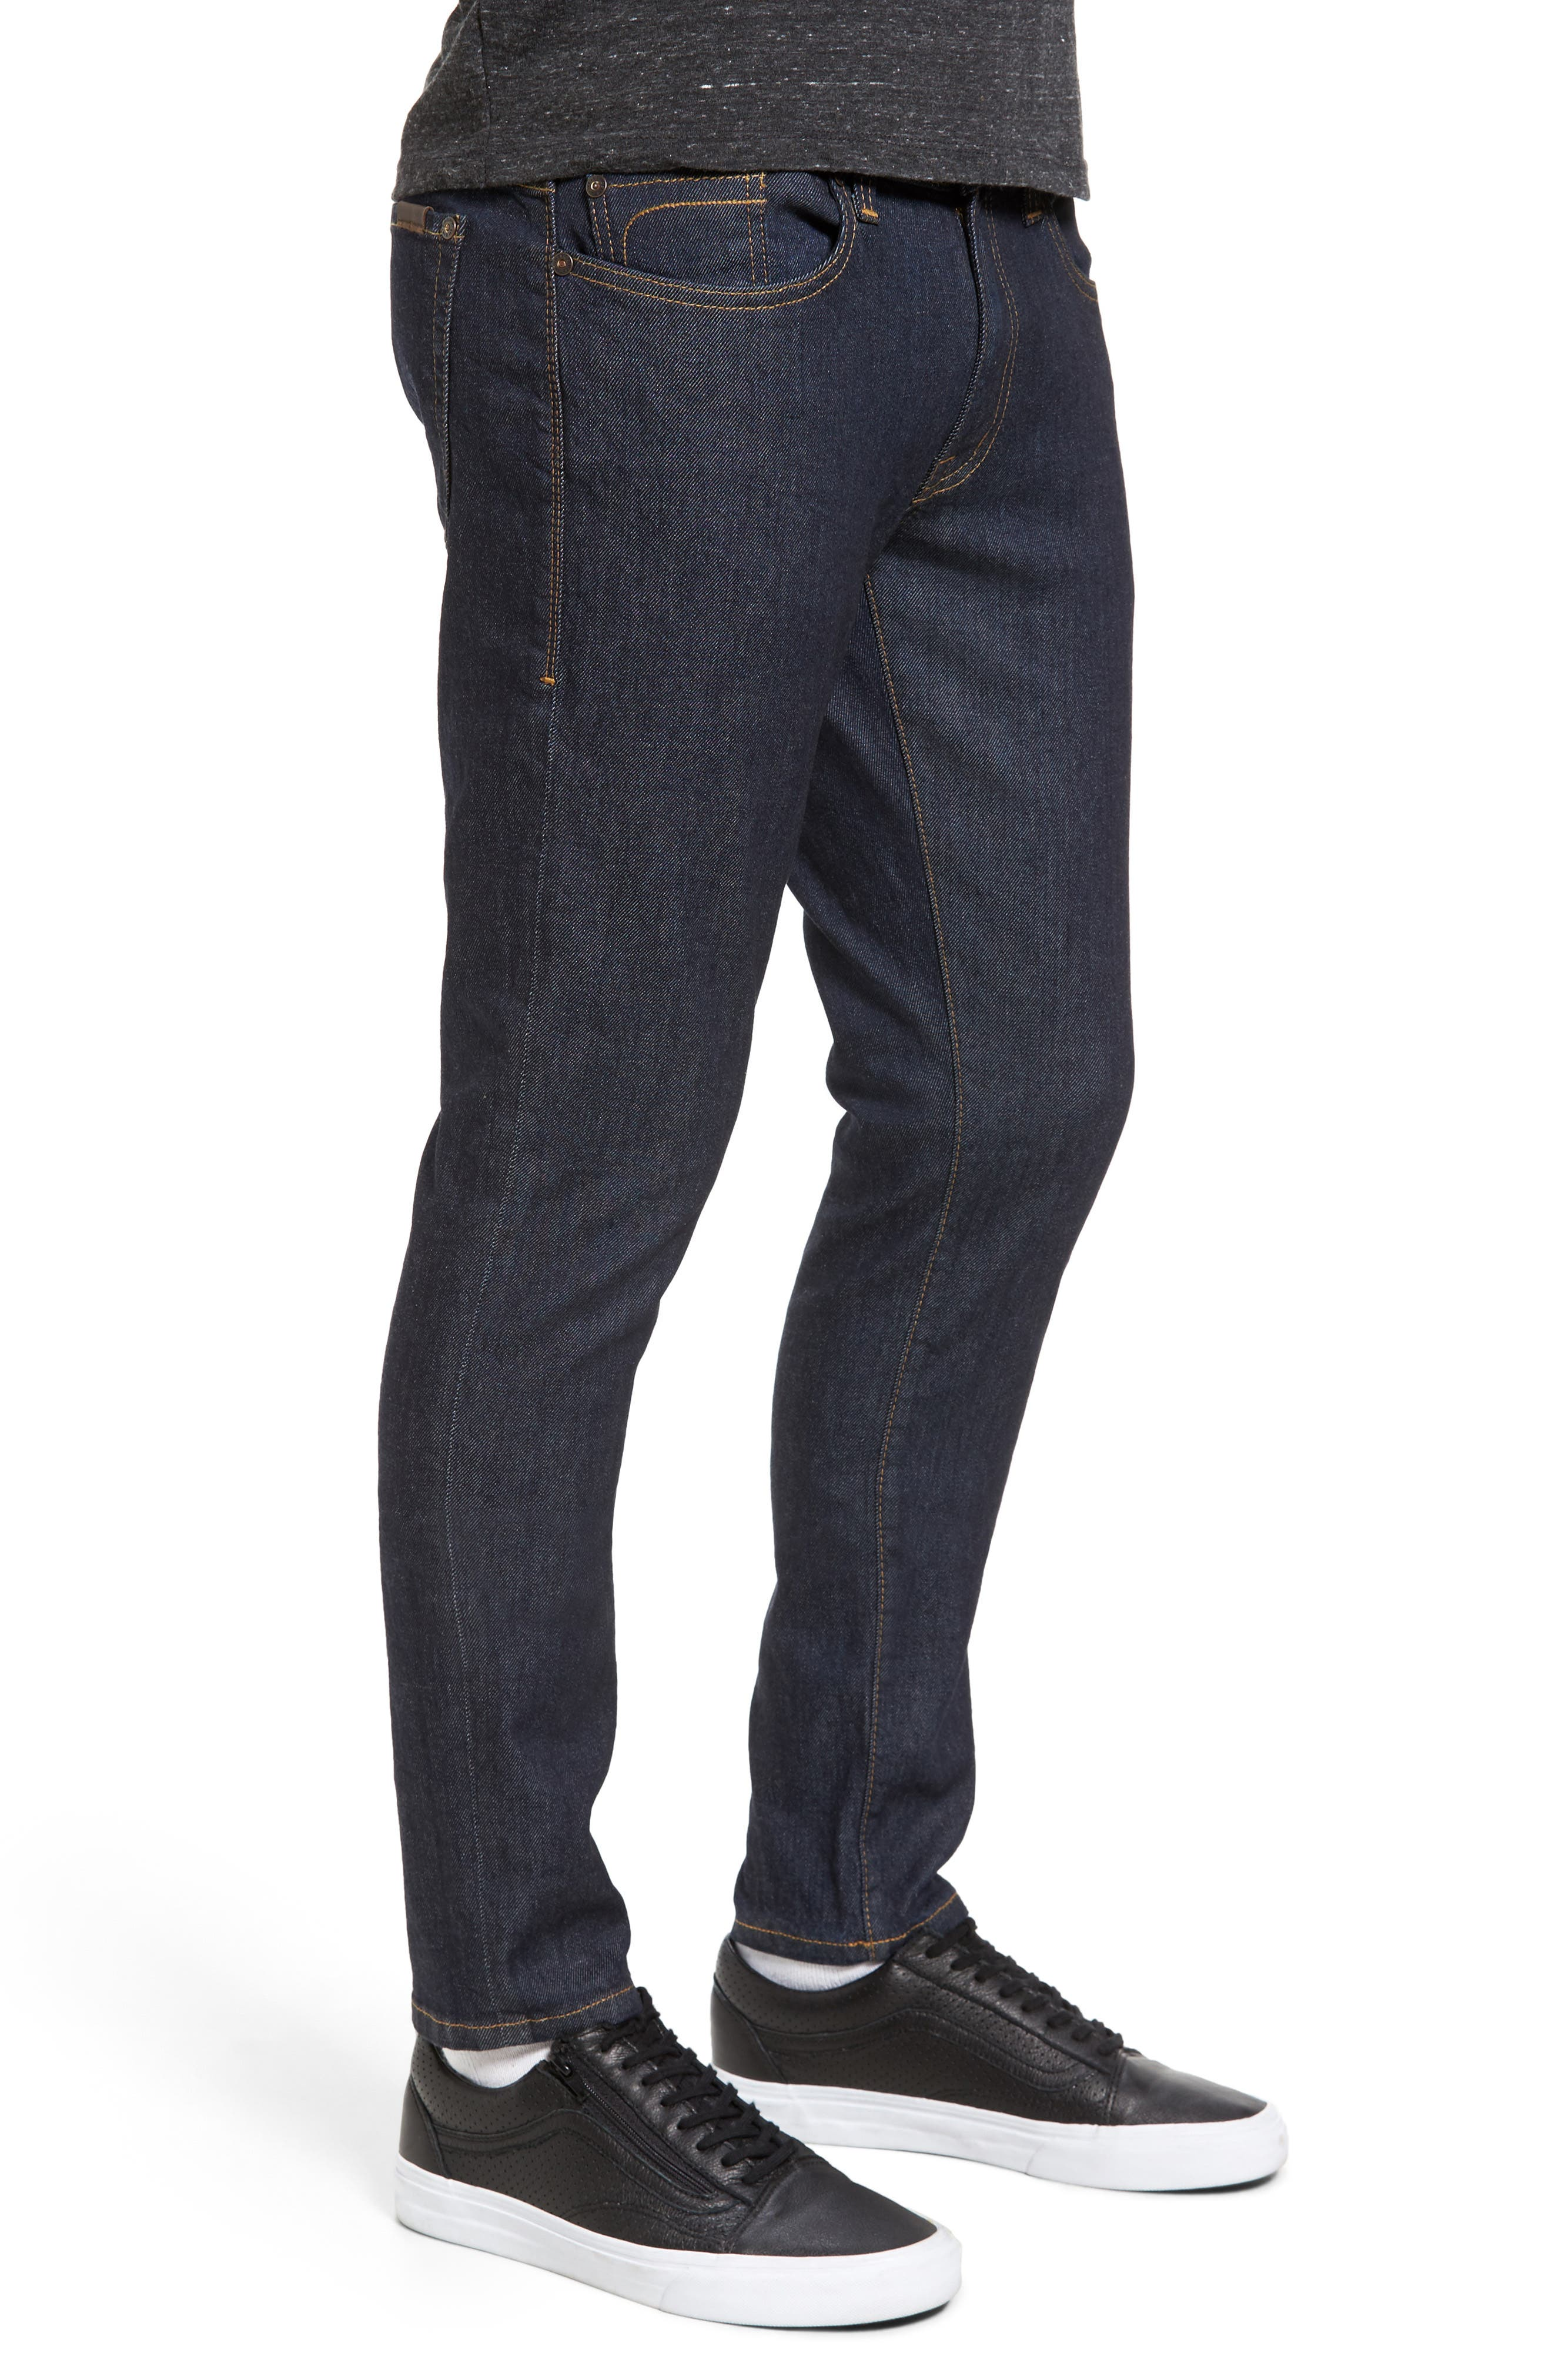 Vantage Skinny Fit Jeans,                             Alternate thumbnail 4, color,